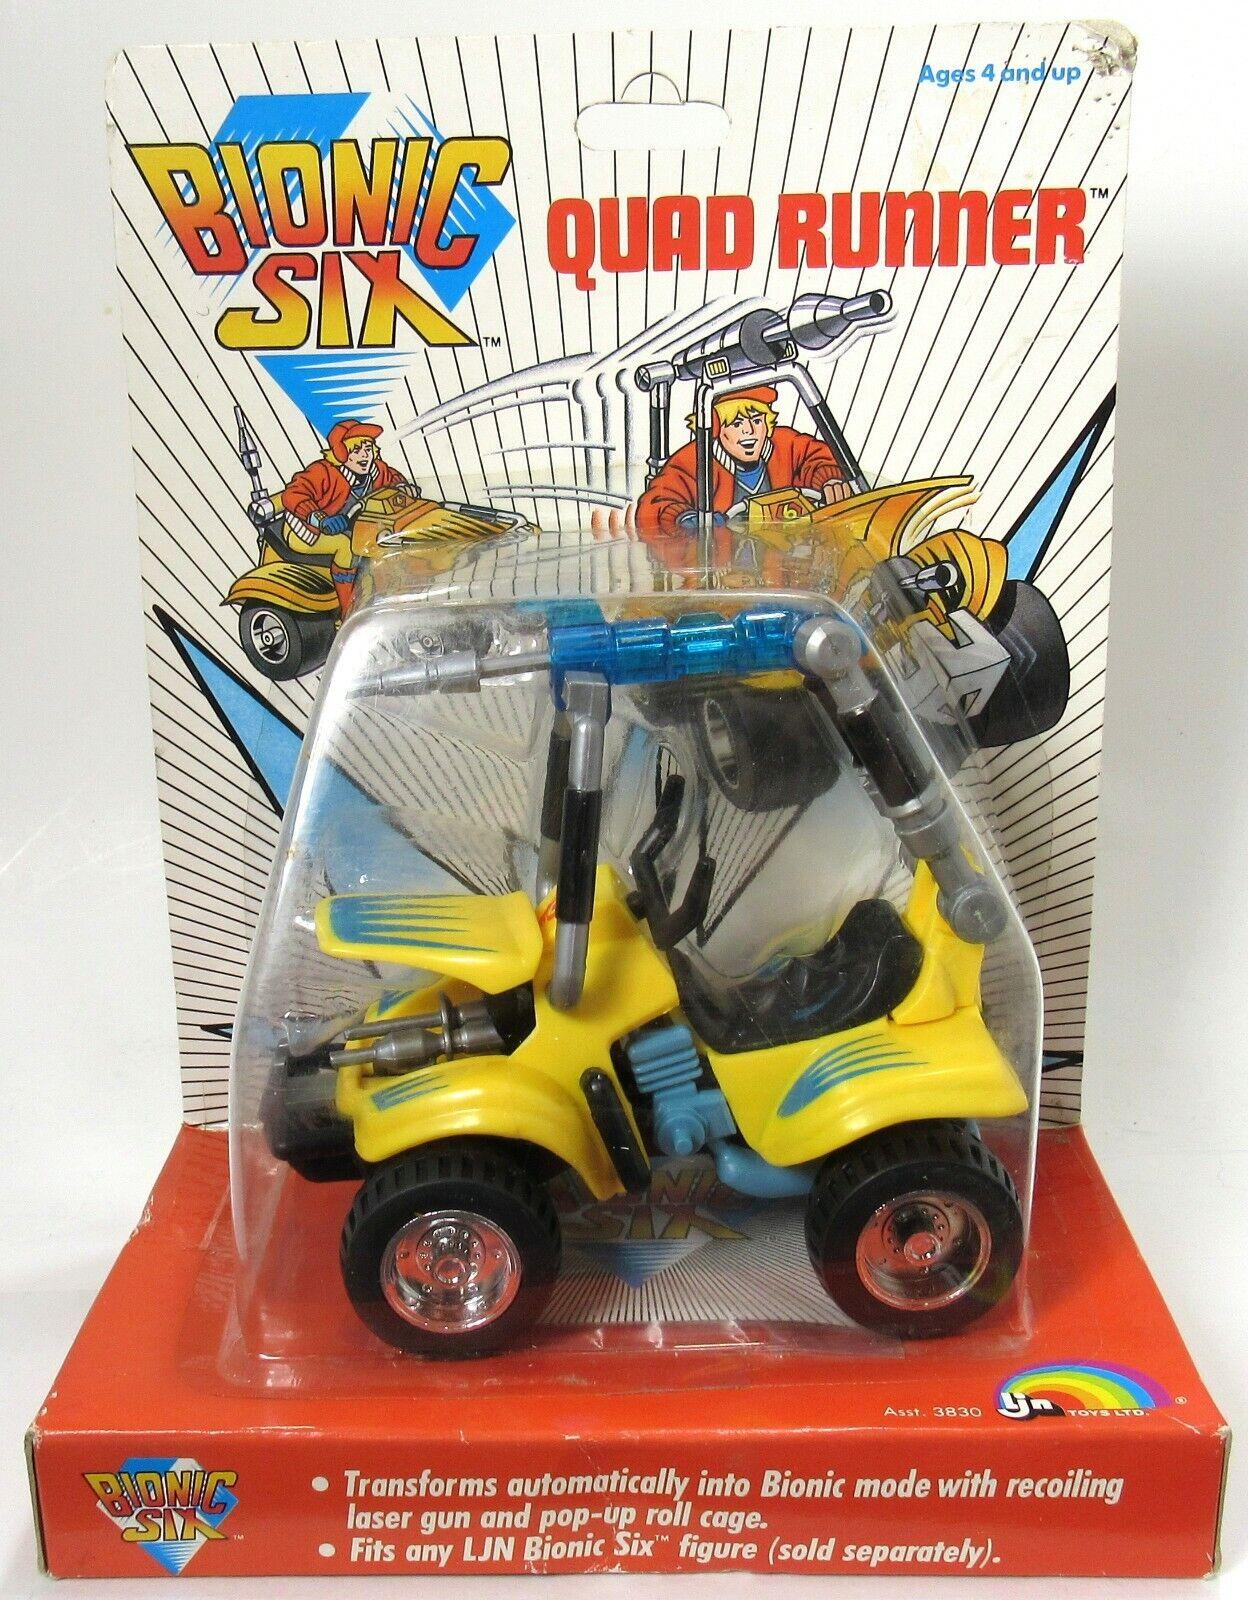 Nuovo Sealed Vintage LJN Bionic 6 Quad correrener 1986 RARE